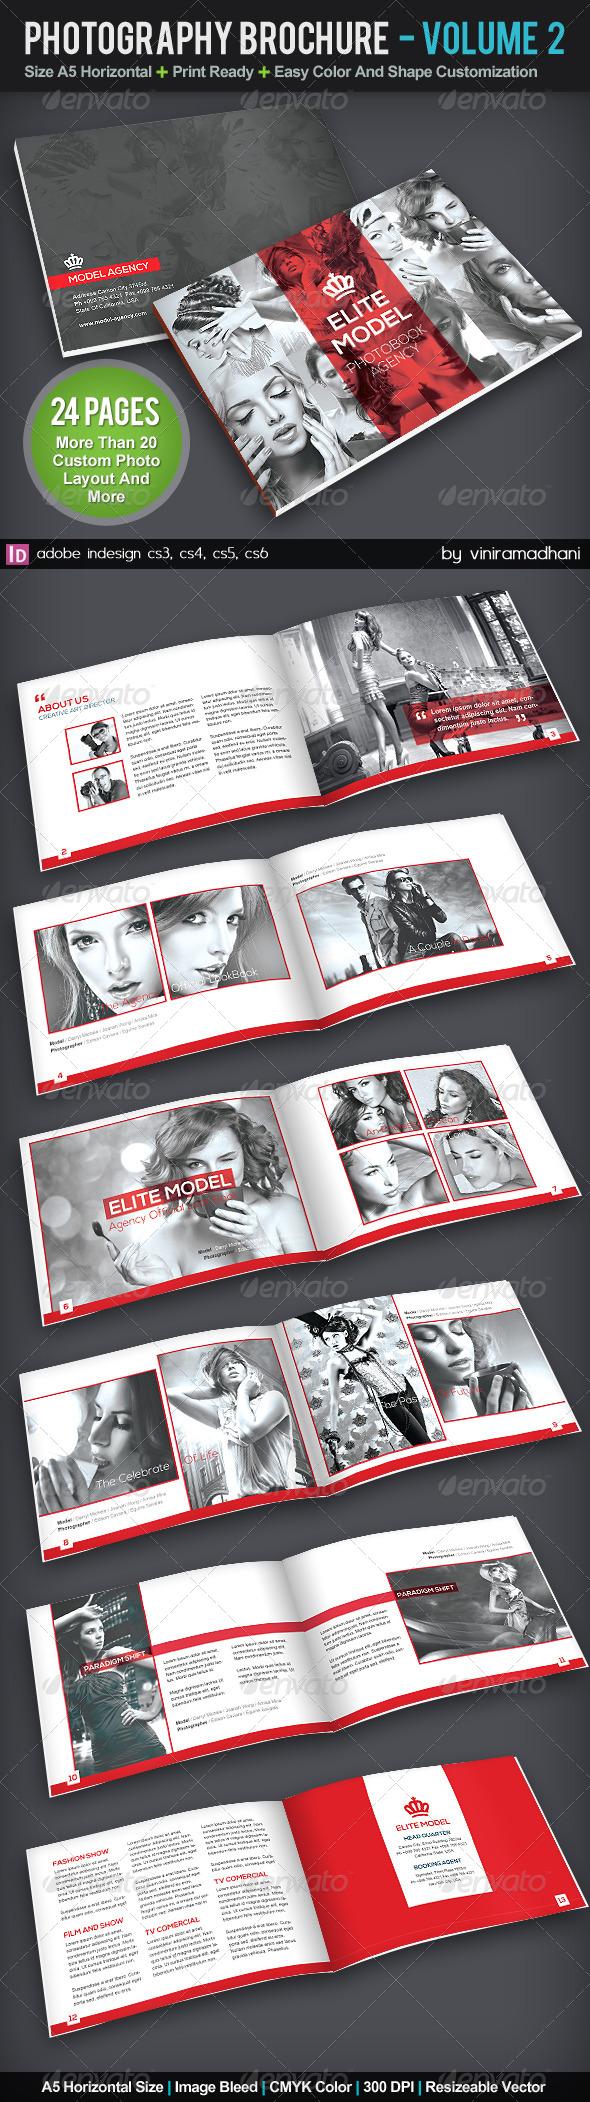 Photography Portfolio Brochure | Volume 2 - Portfolio Brochures